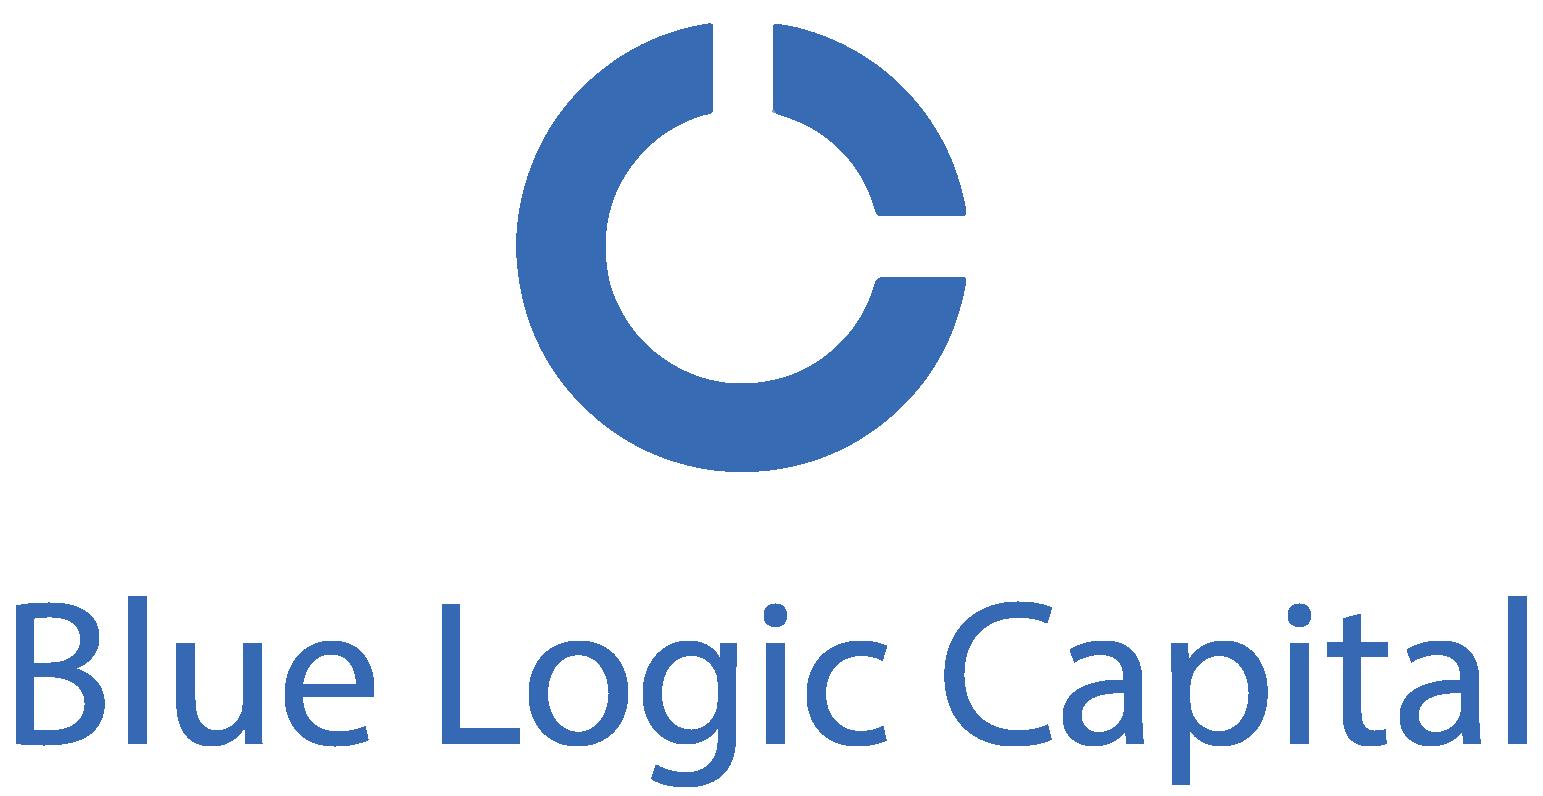 Blue Logic Capital blue logo